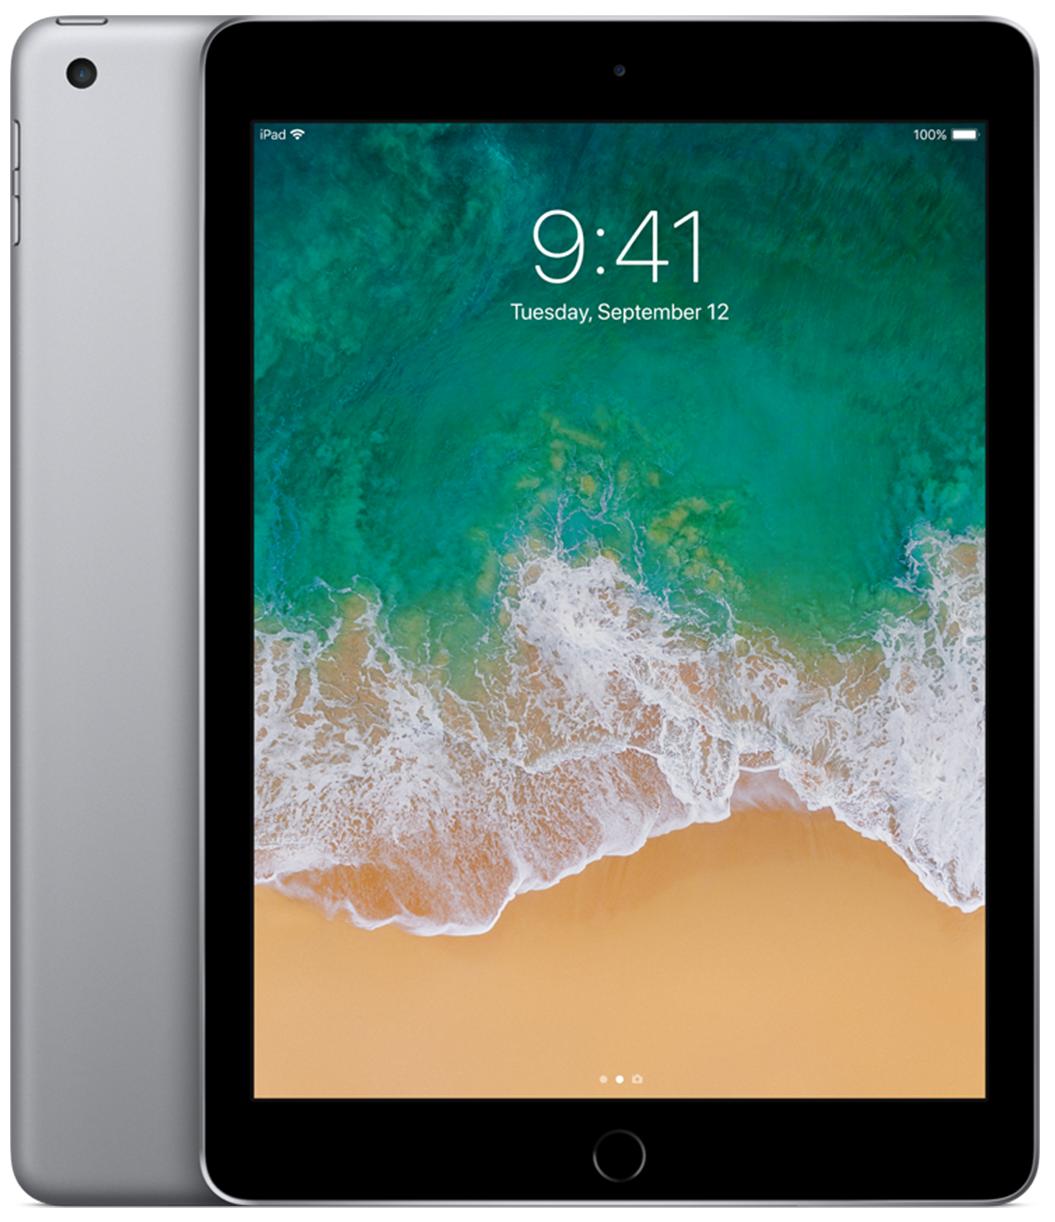 Apple iPad 5 (2017) - 128GB - Space Gray - B+ Grade Tweedehands